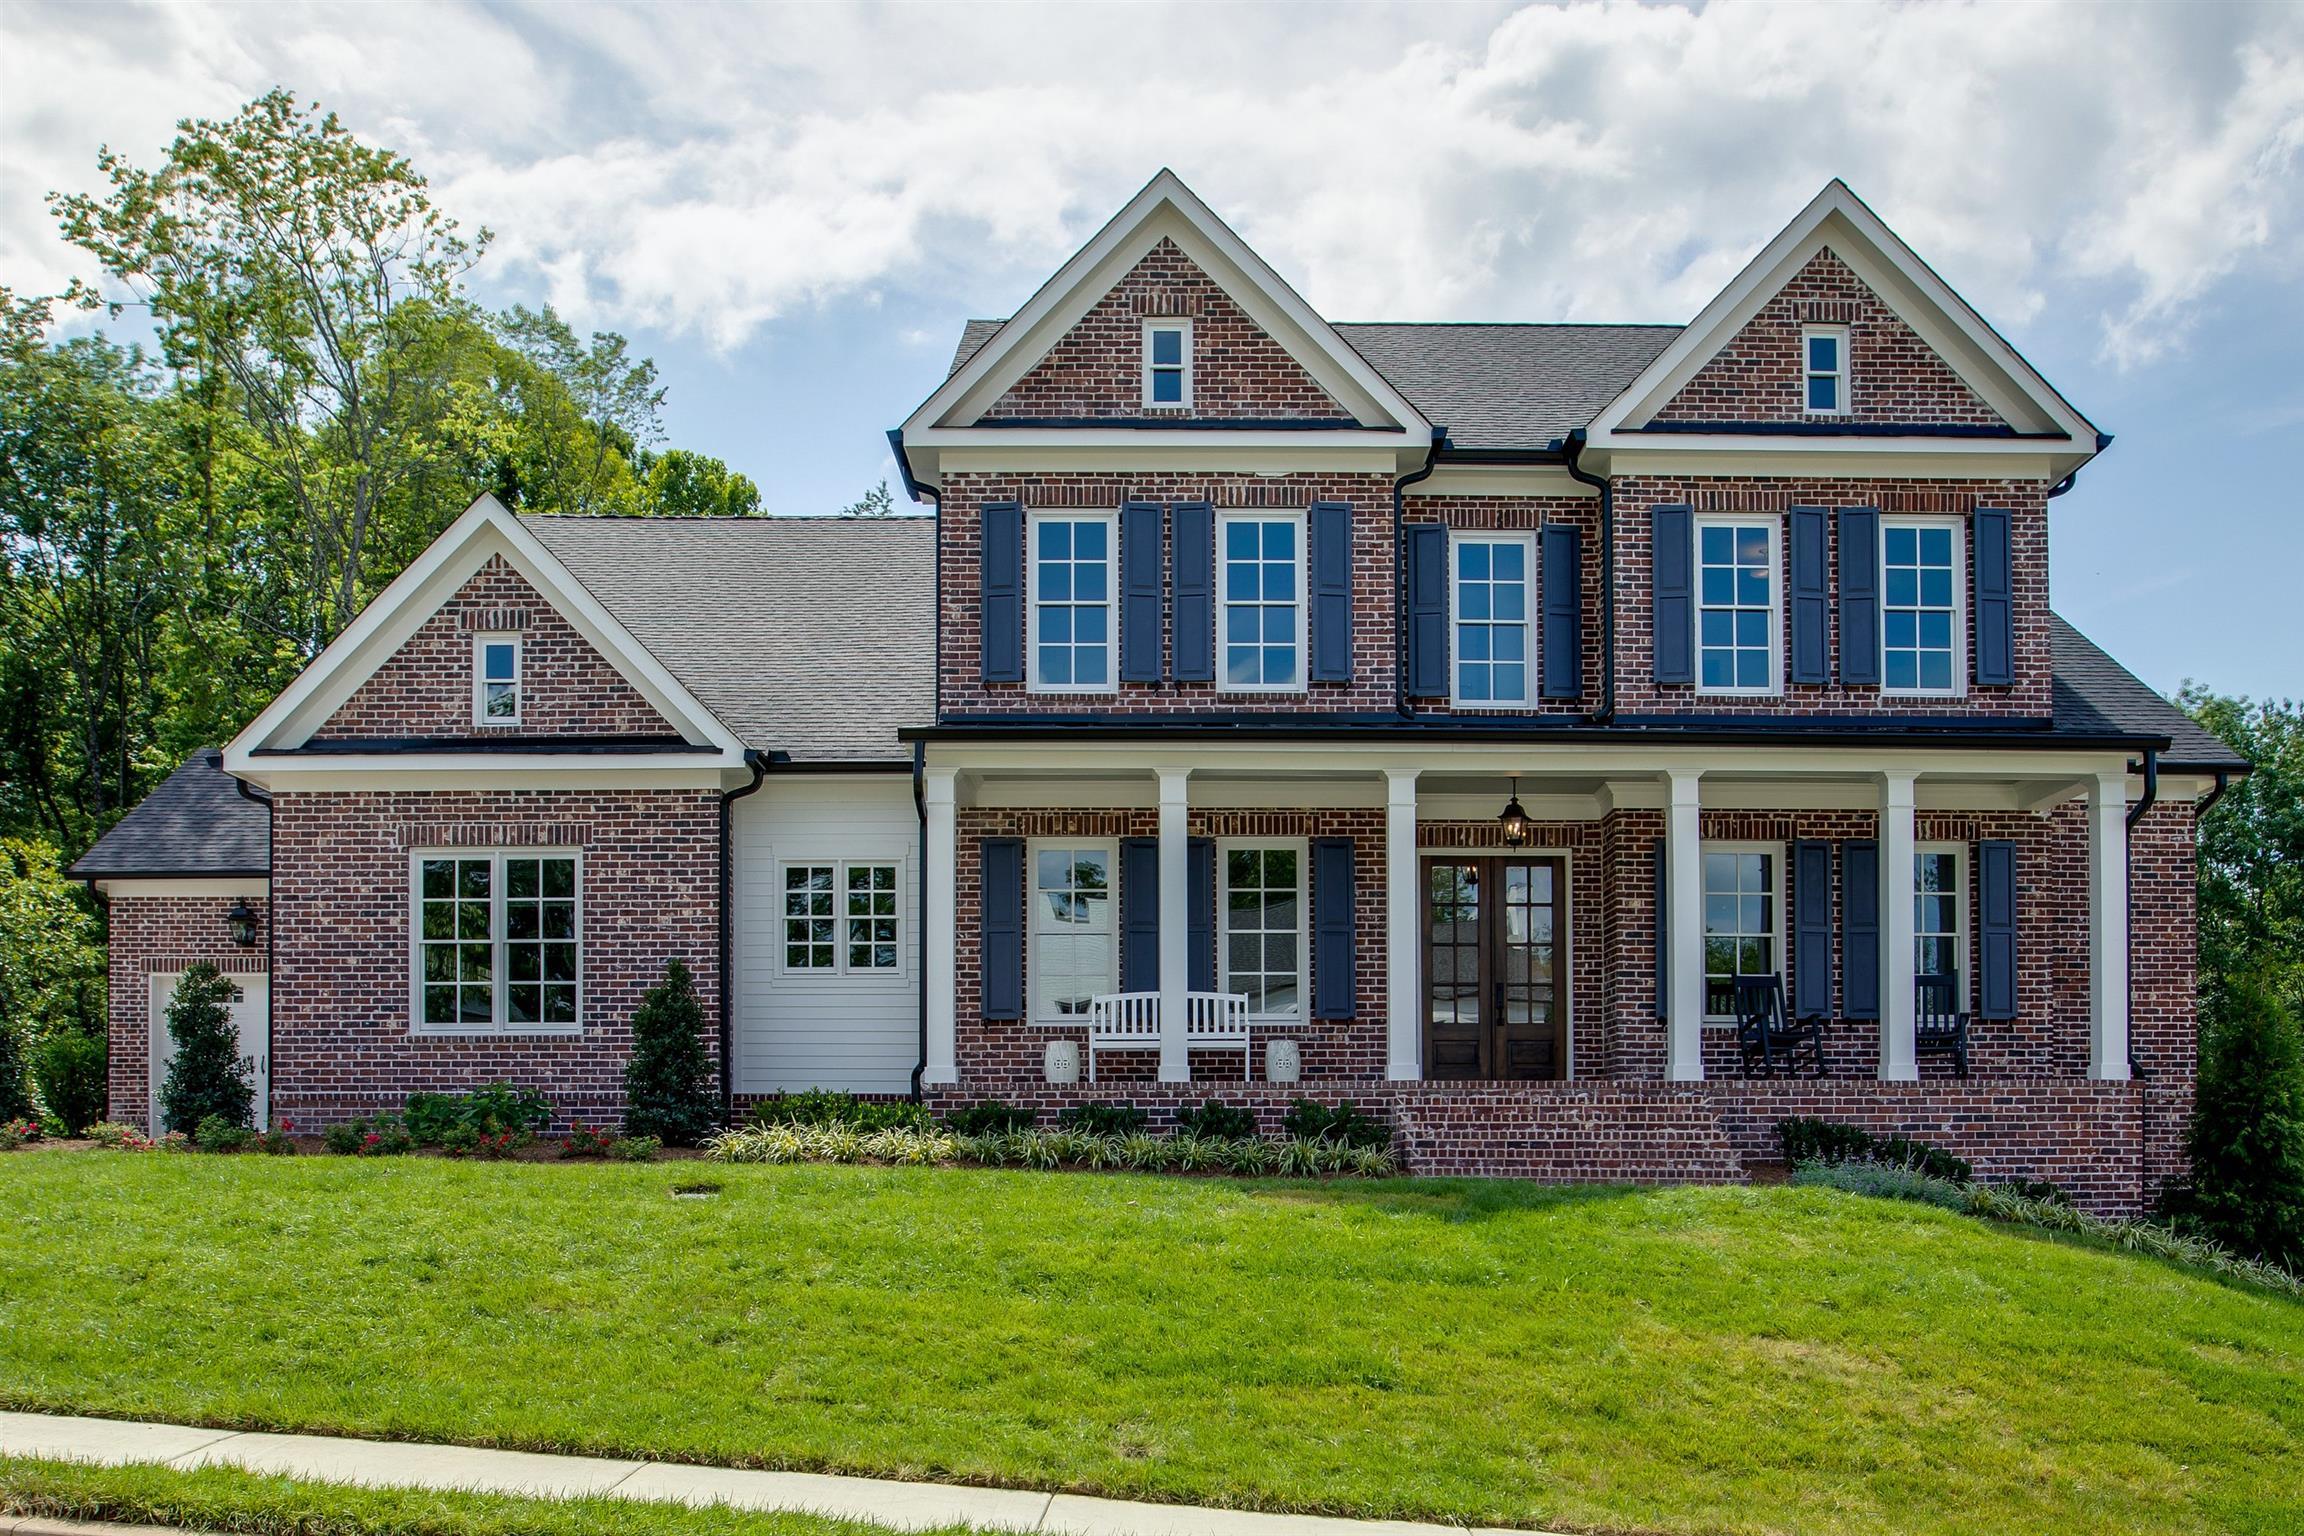 6690 Hastings Ln, Franklin, TN 37069 - Franklin, TN real estate listing